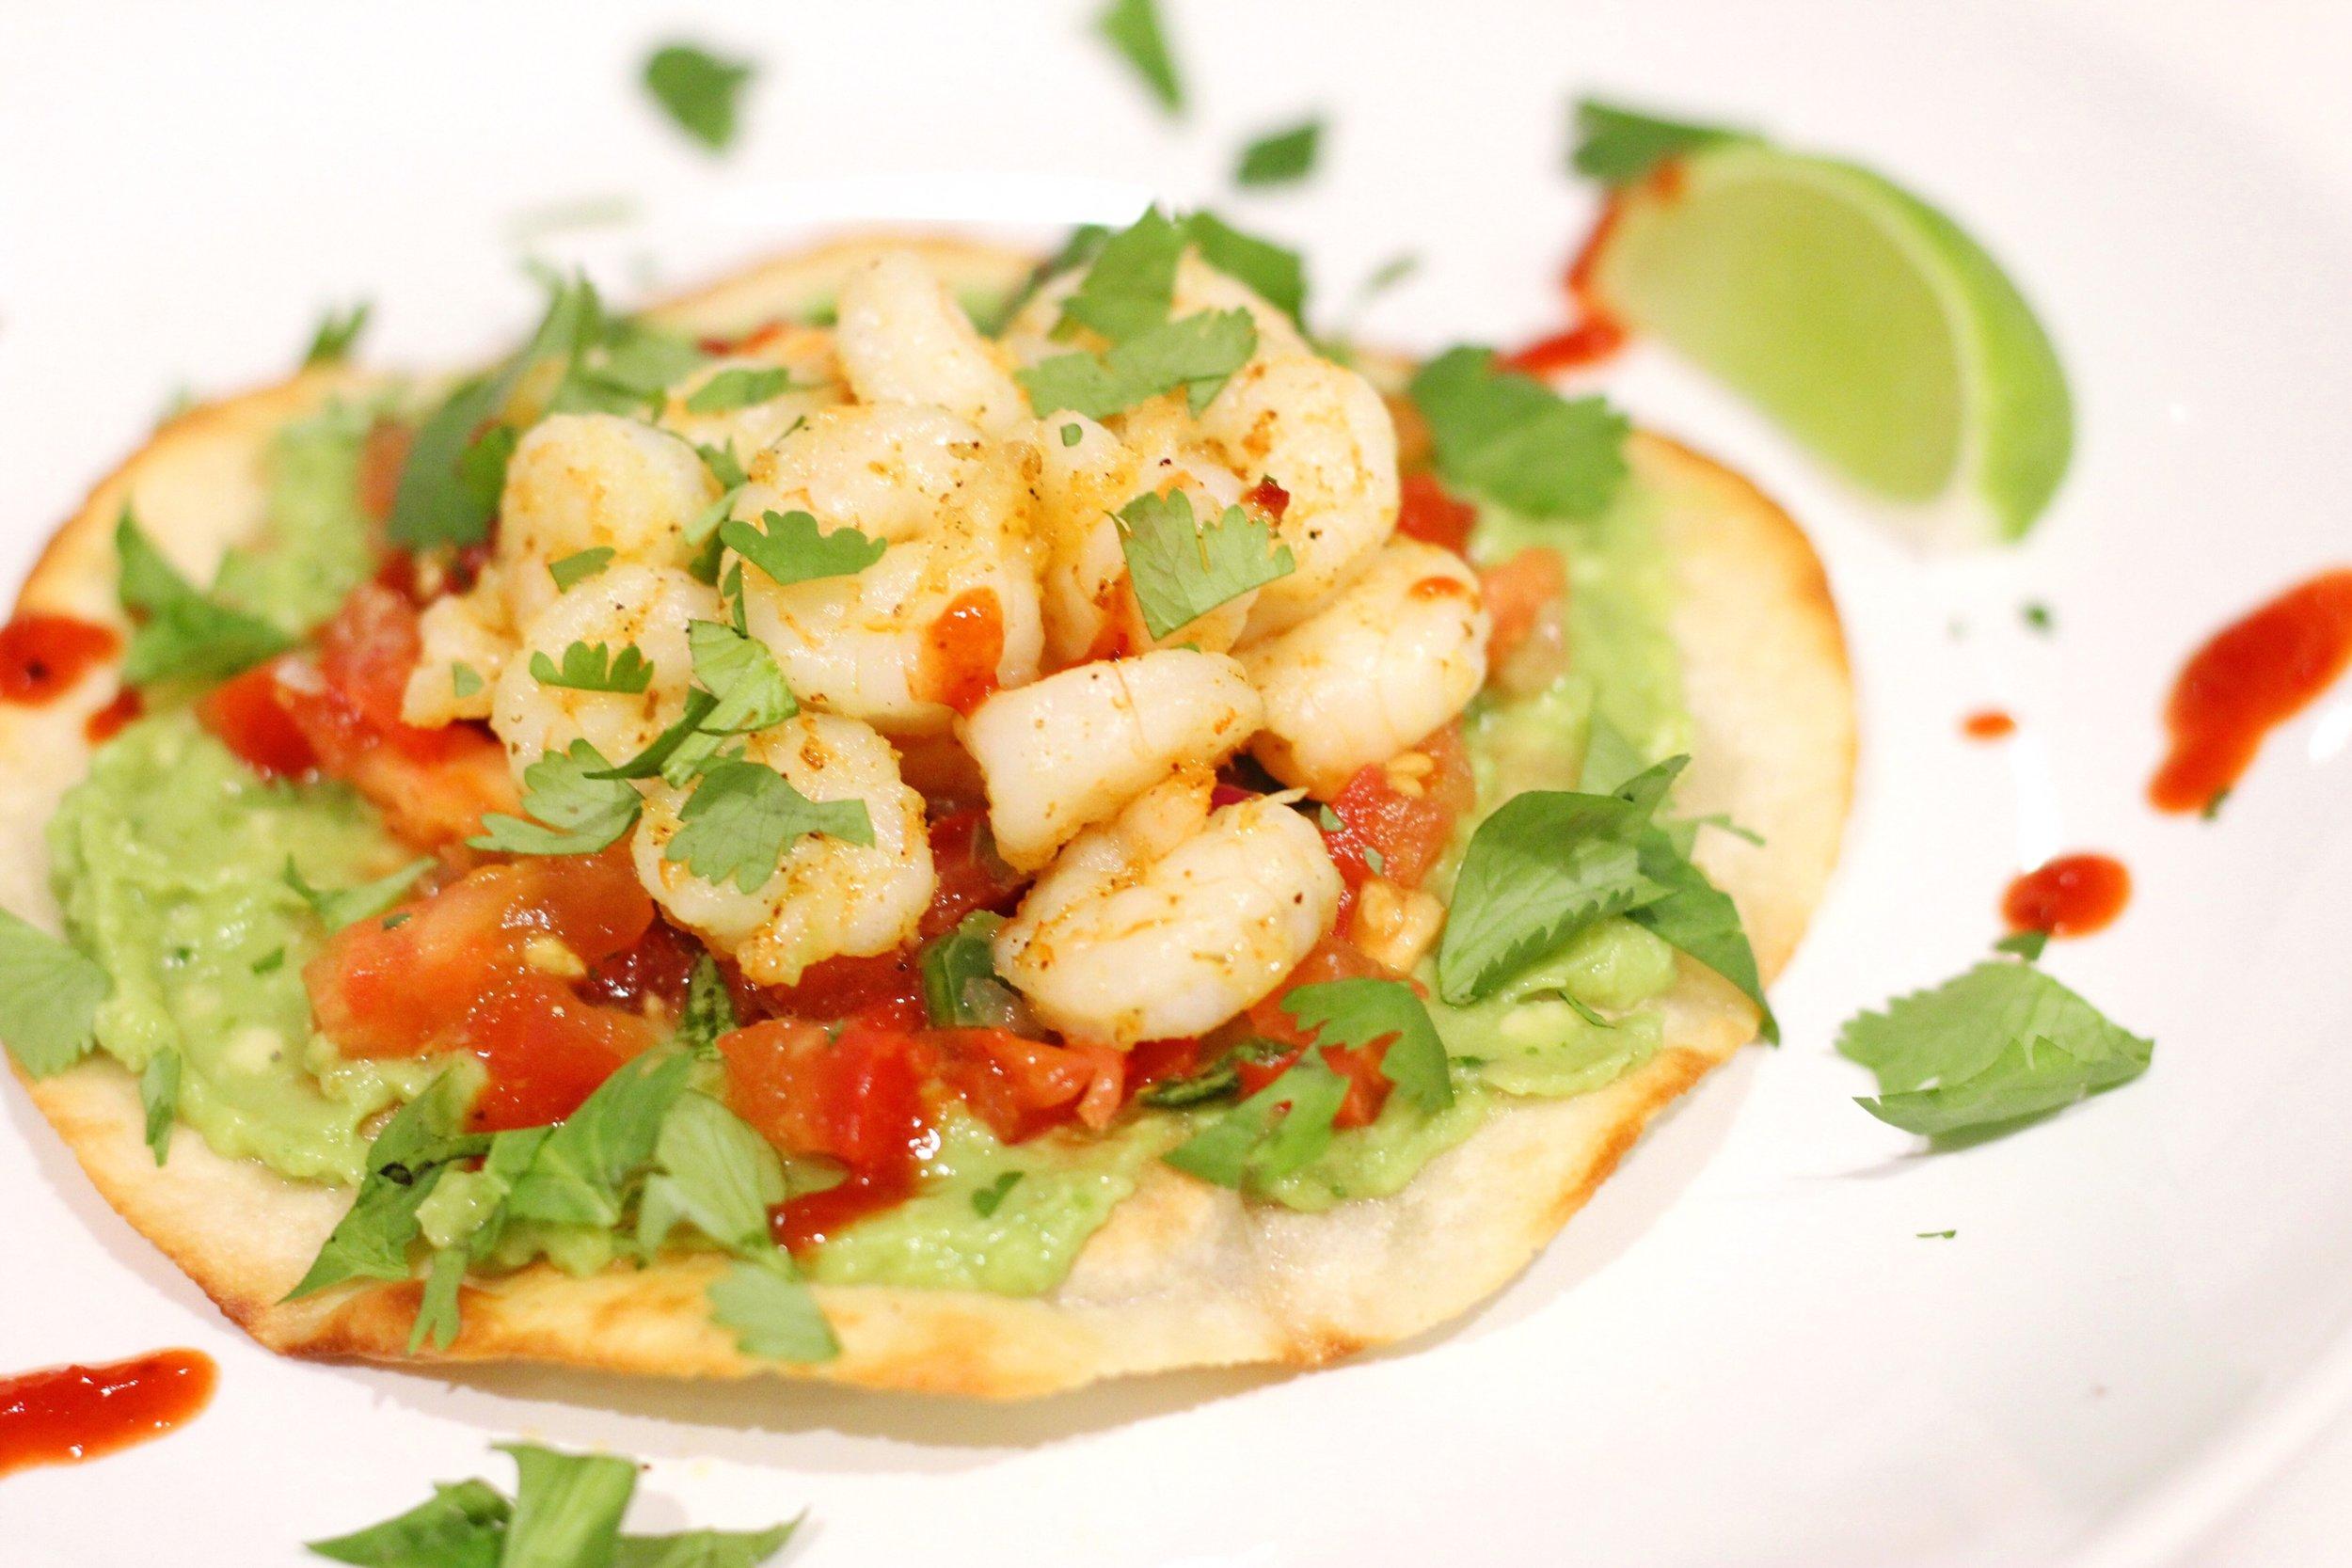 IMG_6087.JPG-paleo-shrimp-tostadas-quick-clean-dinner-ideas